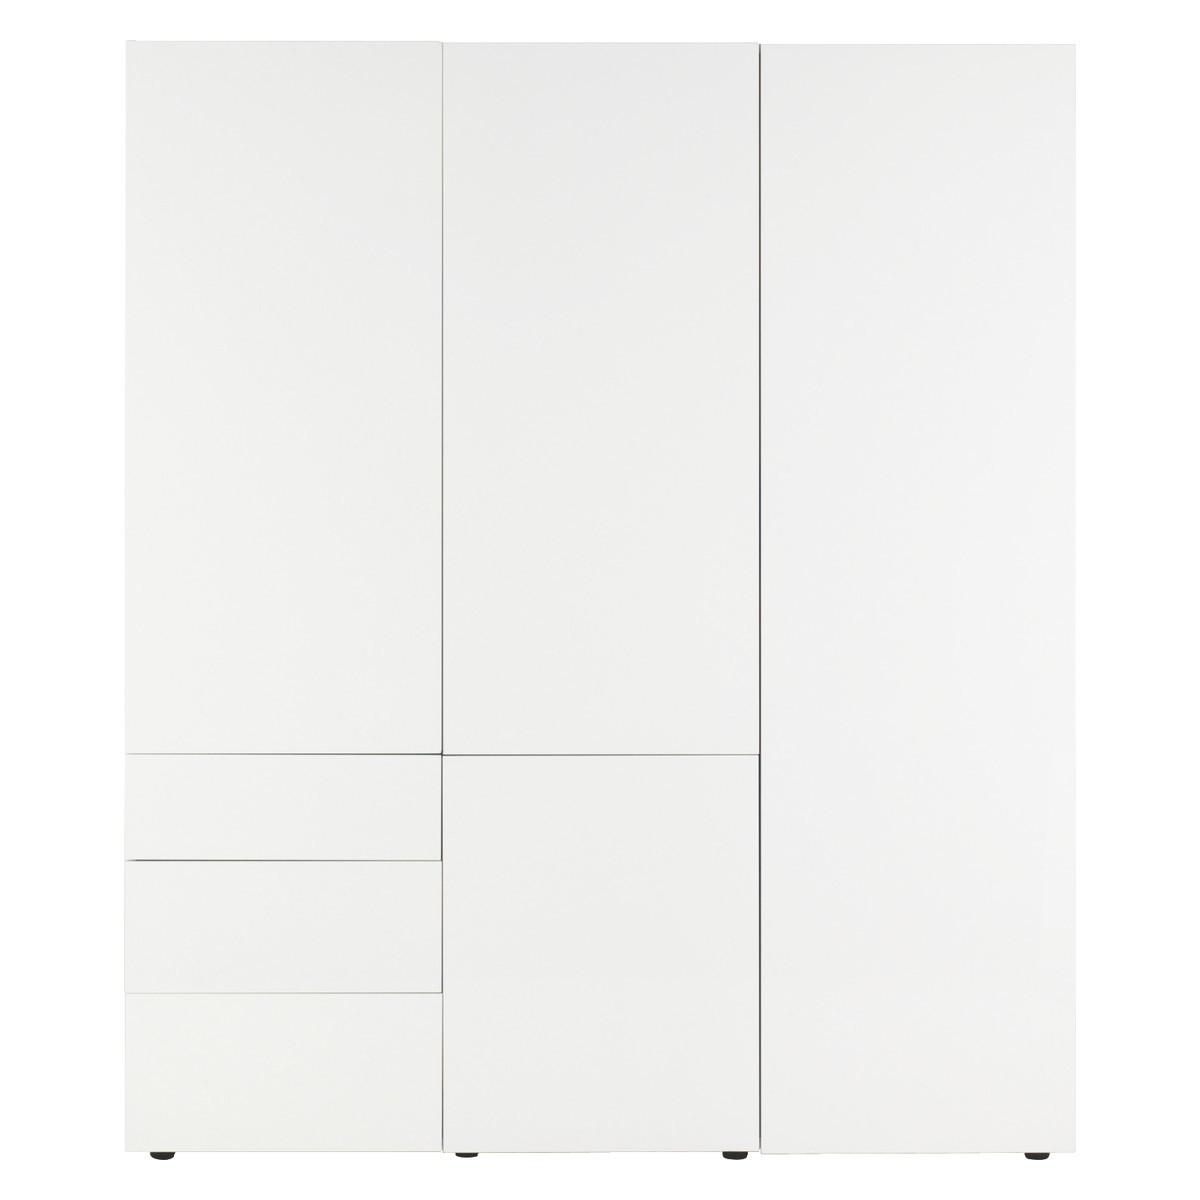 Perouse White 3 Door Wardrobe 180Cm Width (View 5 of 15)